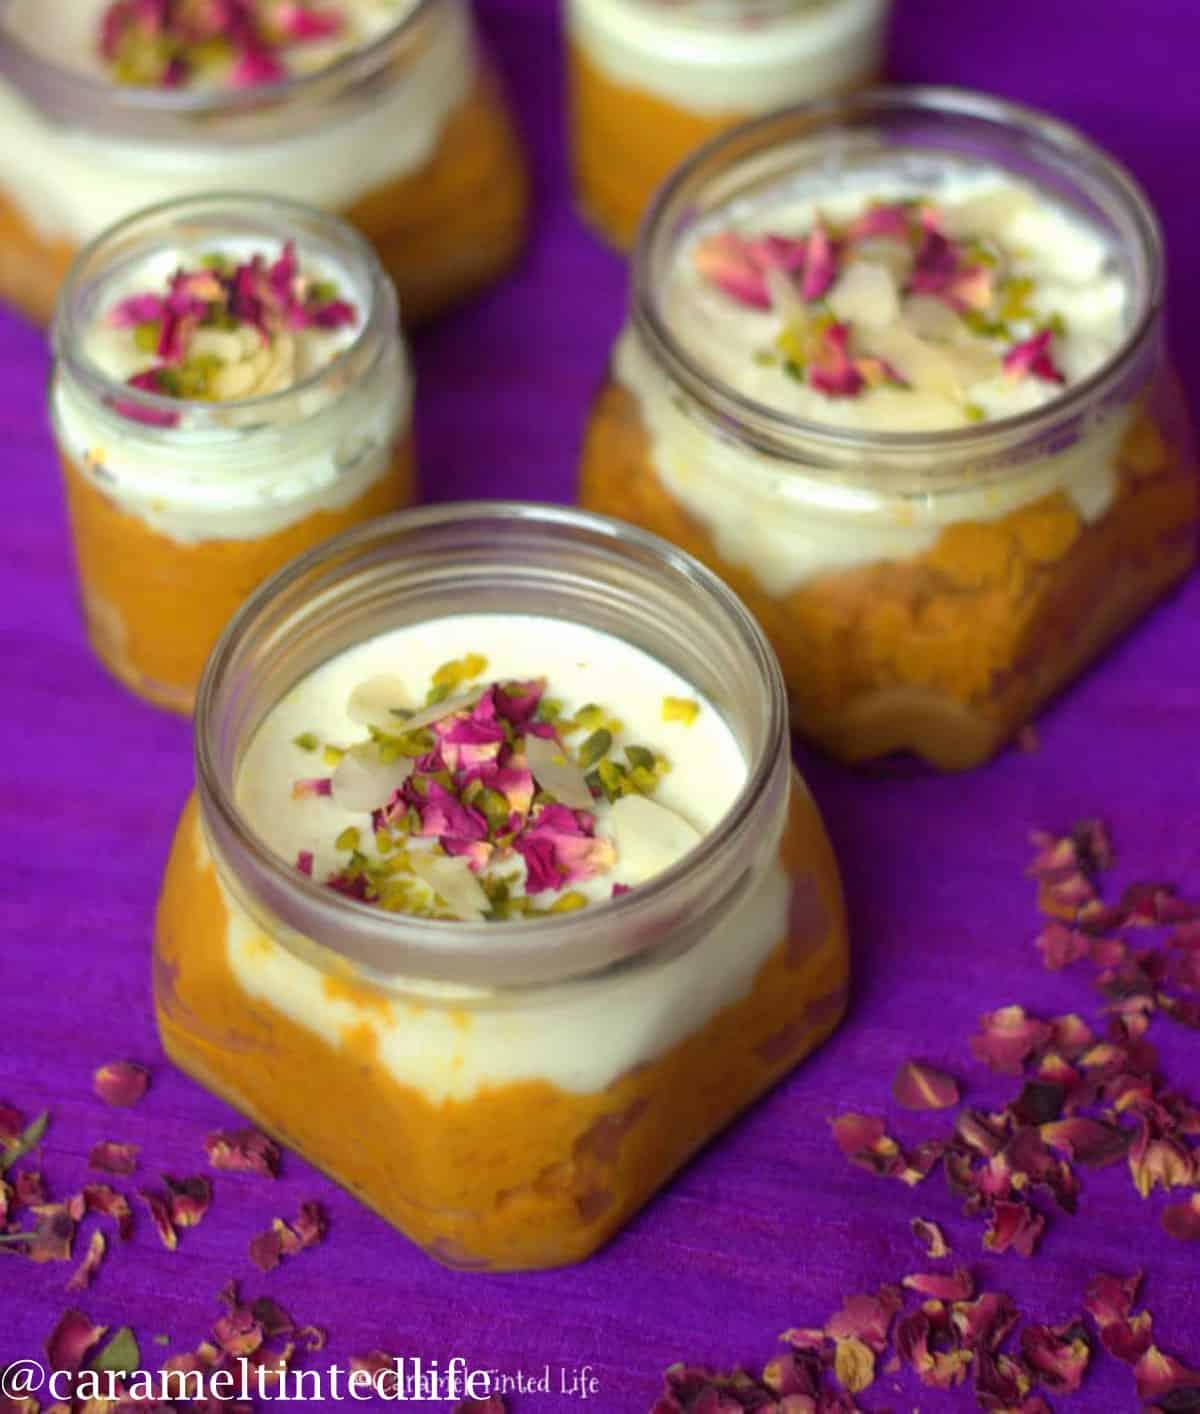 Jars with layers of phirni, dulce de leche, gajar halwa